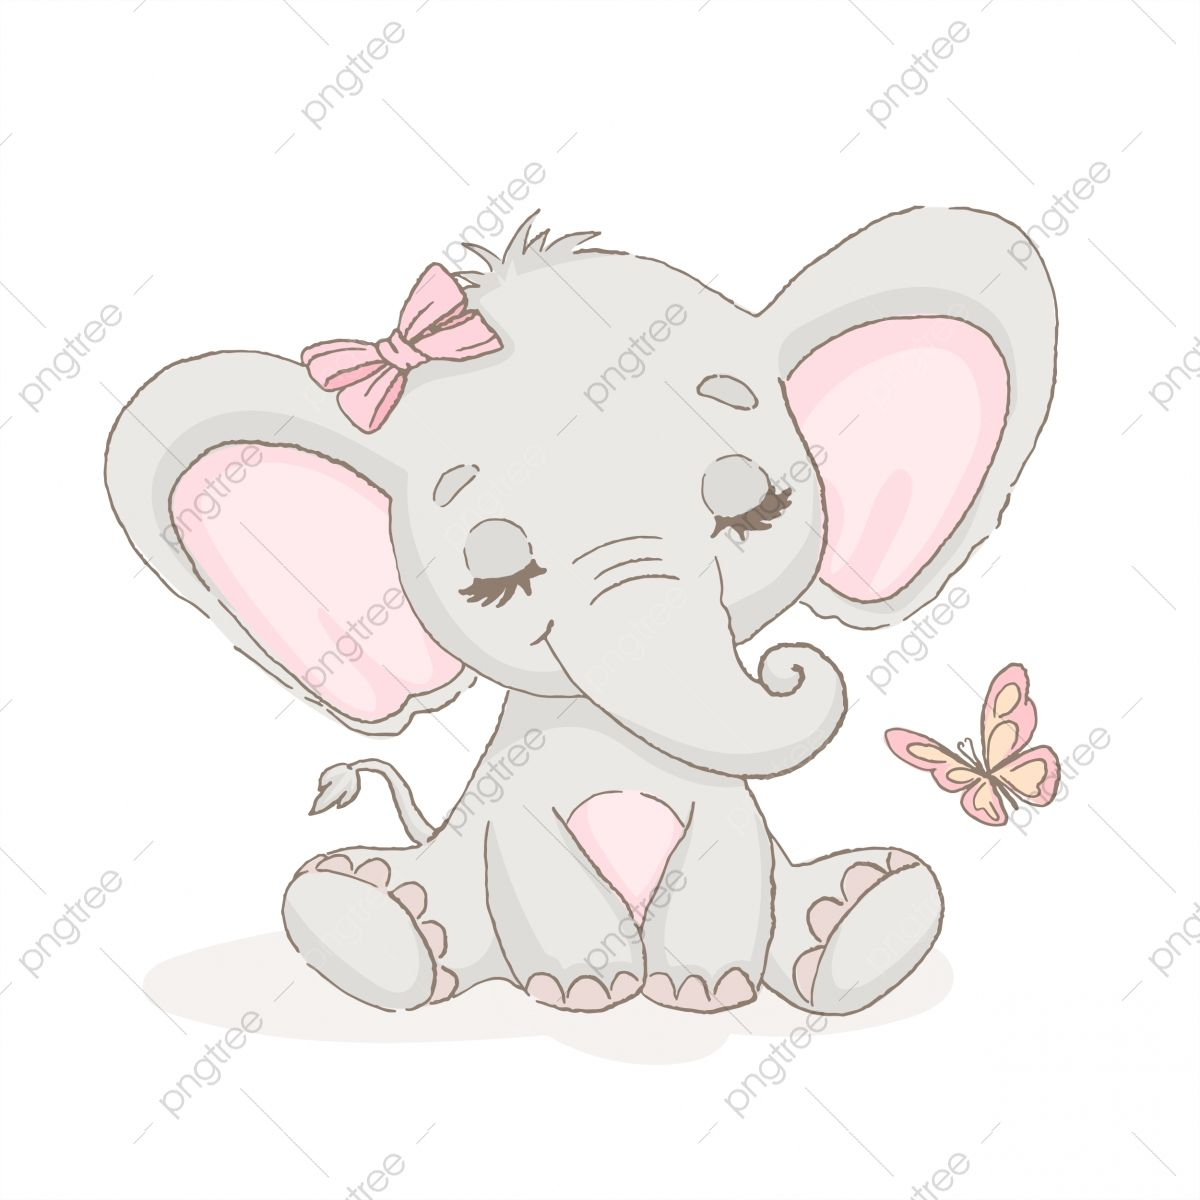 45+ Cute Baby Animal Reading Book Cartoon Clipart